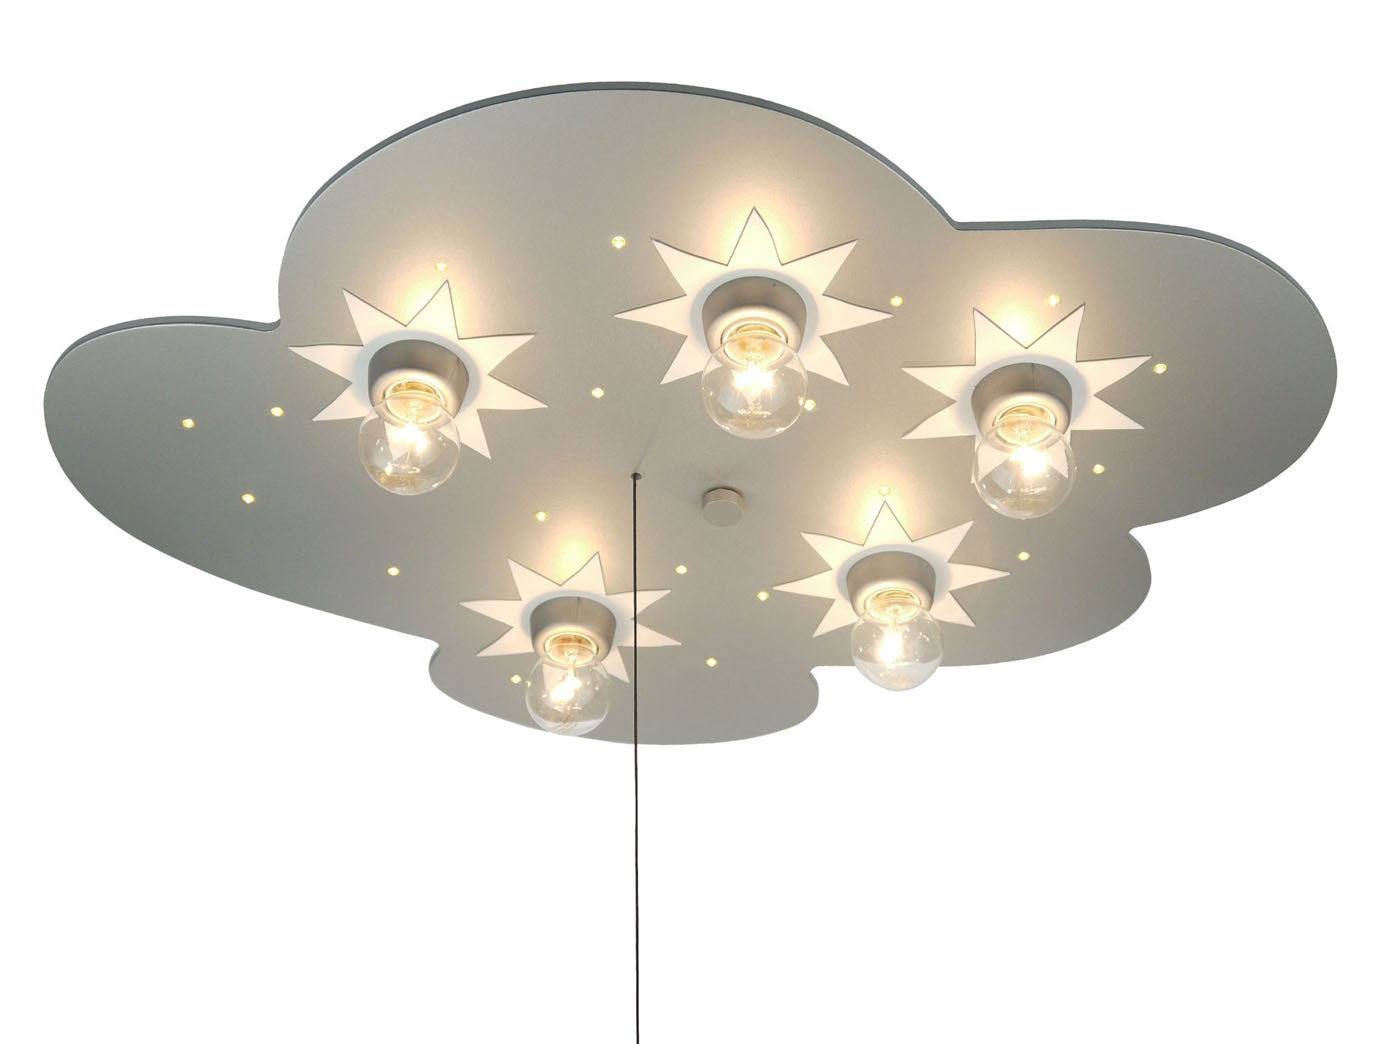 Led Lampe Kinderzimmer Led Sternenhimmel Schlummerlicht Wolkenlampe